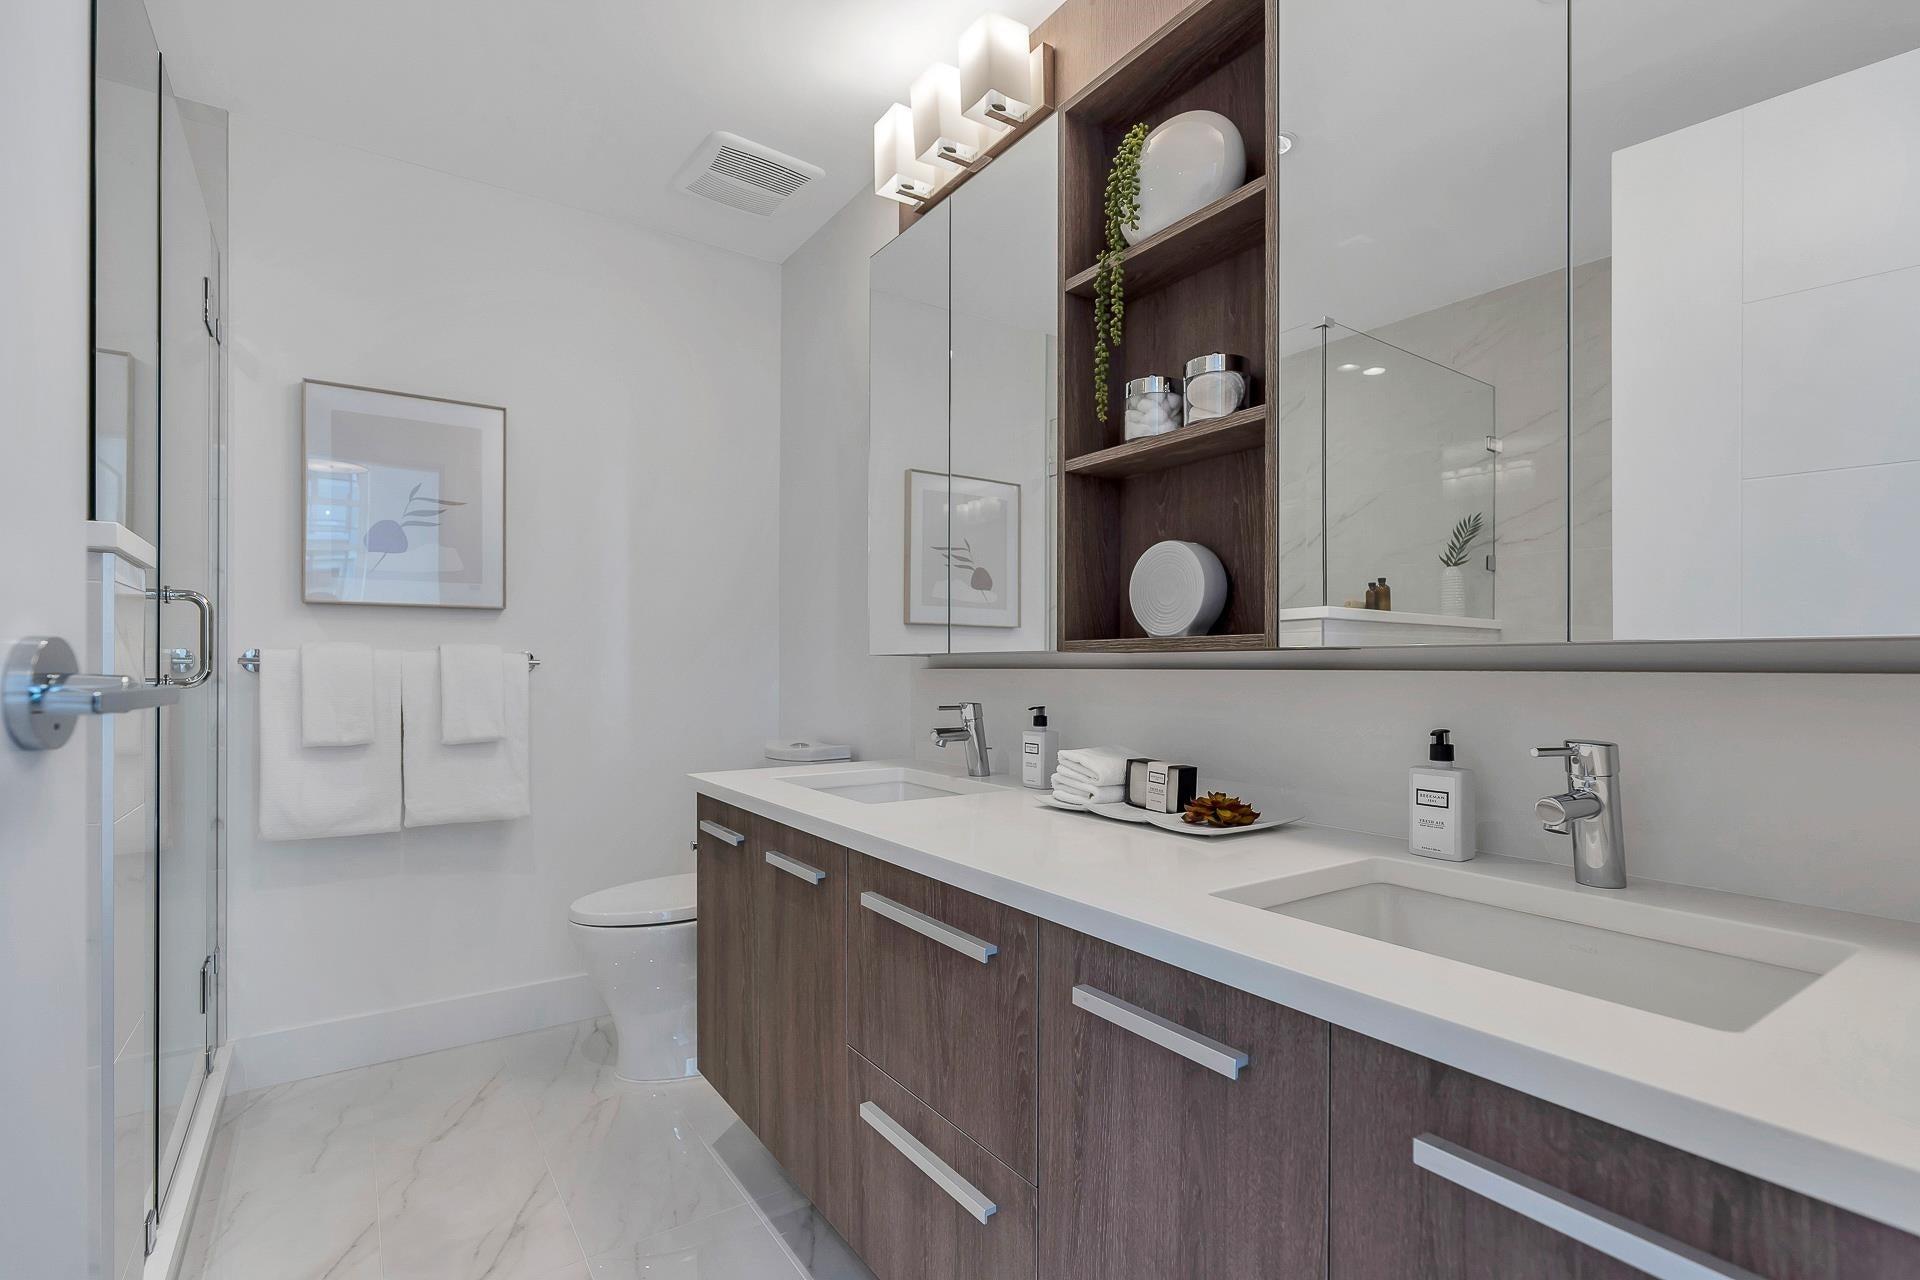 702 2780 VALLEY CENTRE AVENUE - Lynn Valley Apartment/Condo for sale, 3 Bedrooms (R2622279) - #13